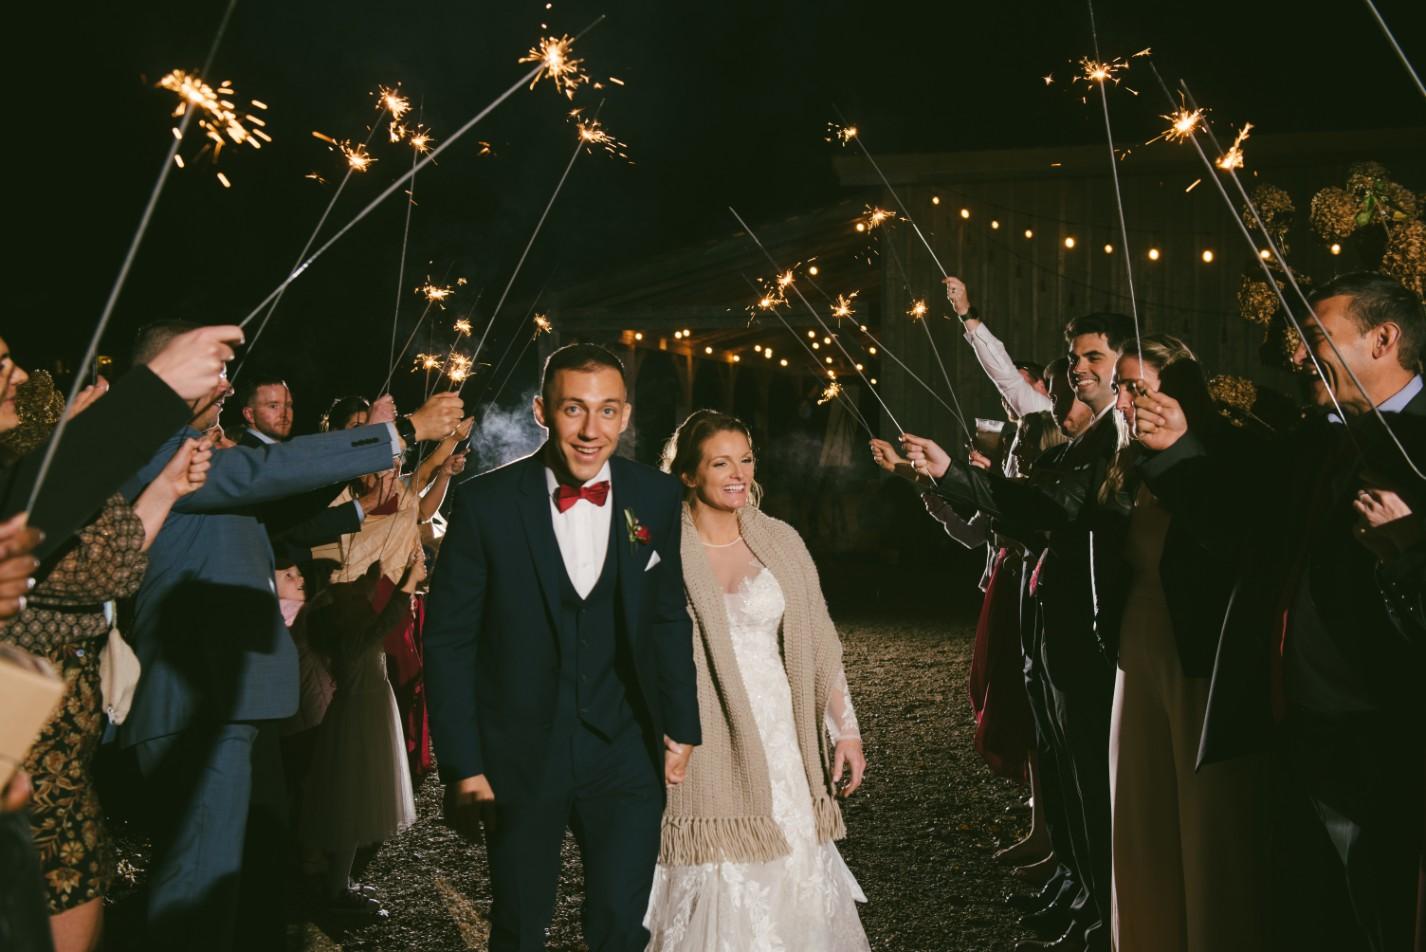 2020 1114 Kirsty And David Wedding 2814